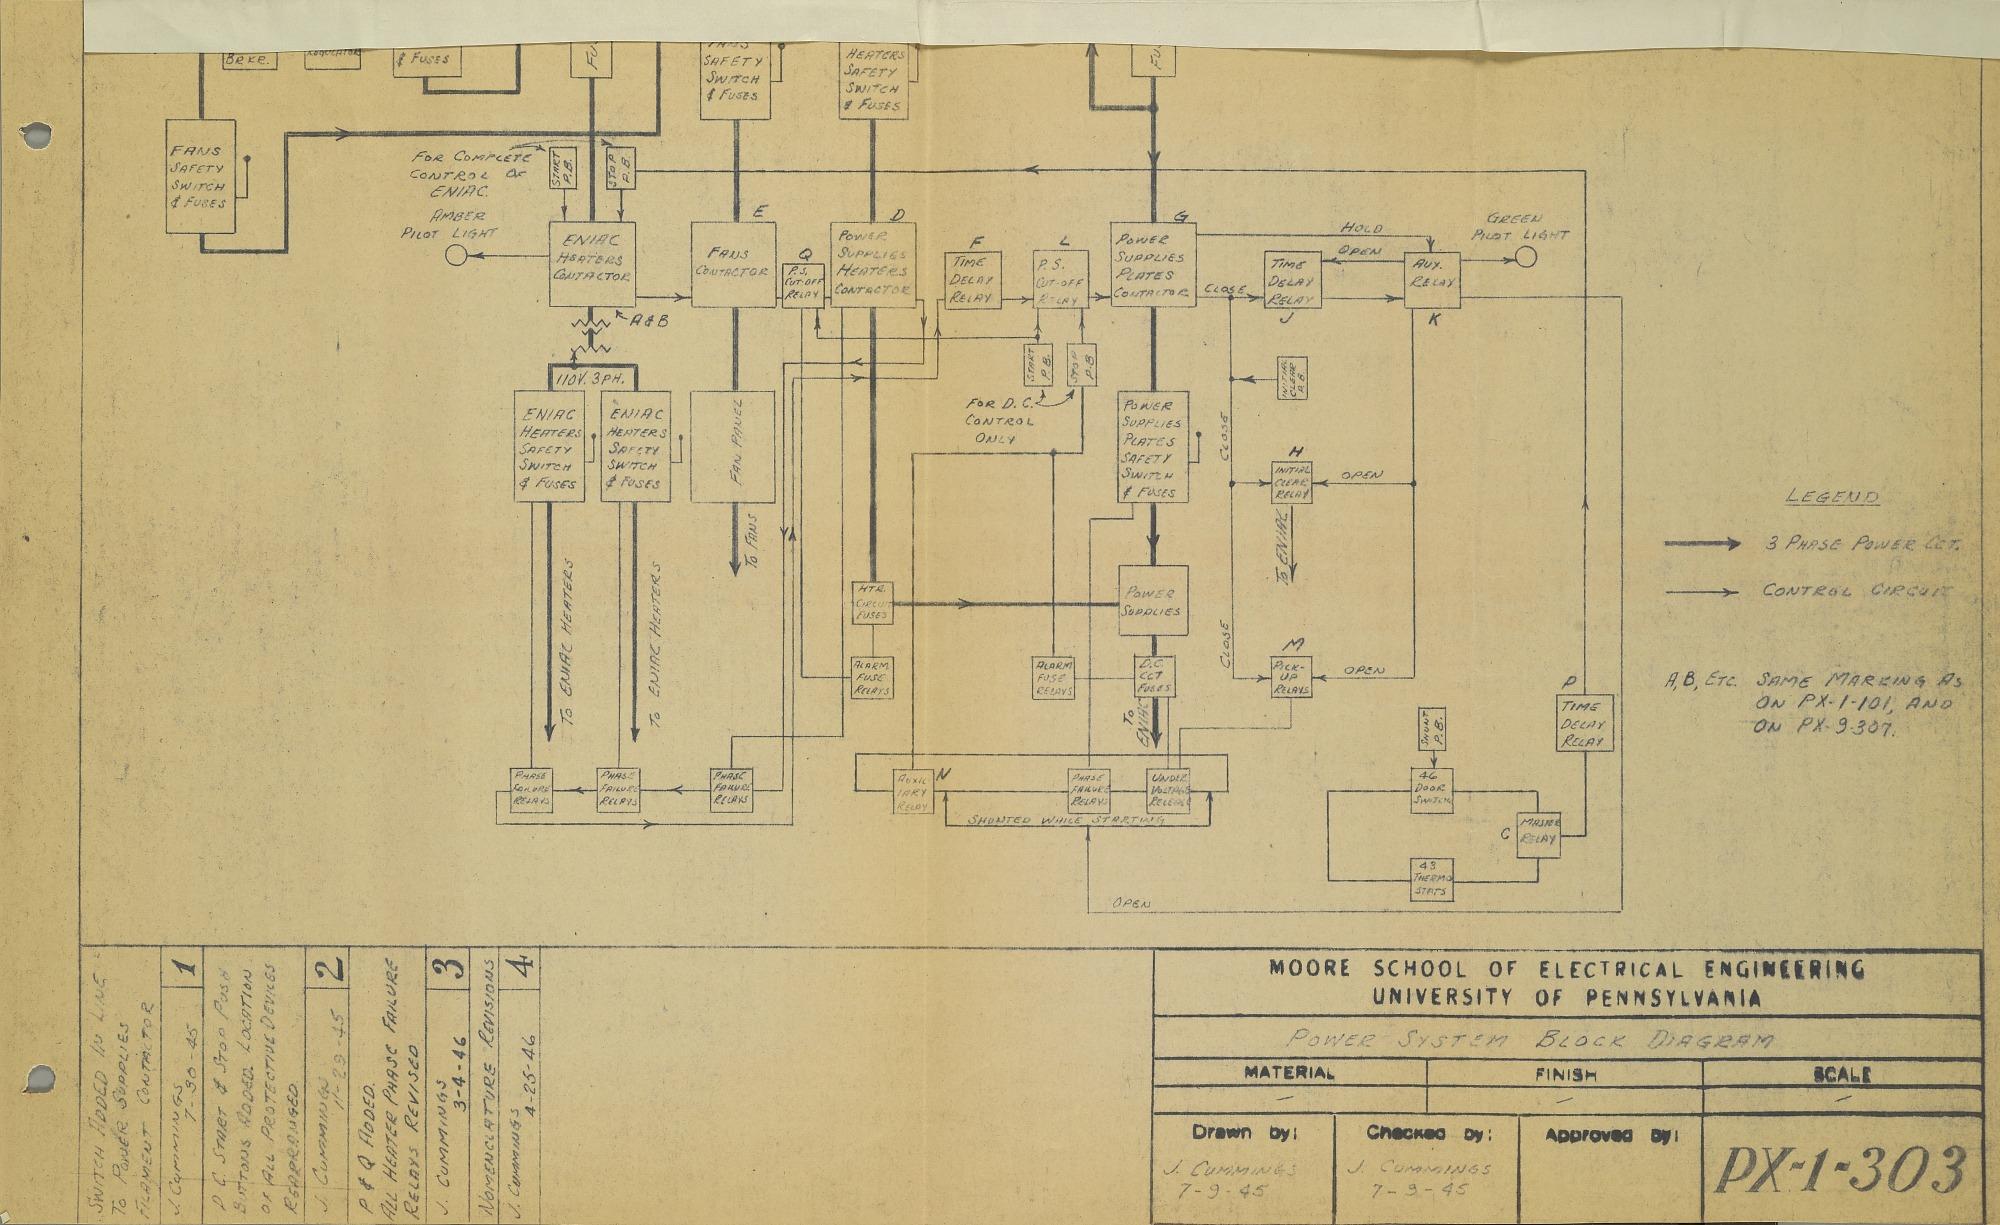 Power System Block Diagram Px 1 303 9 Text